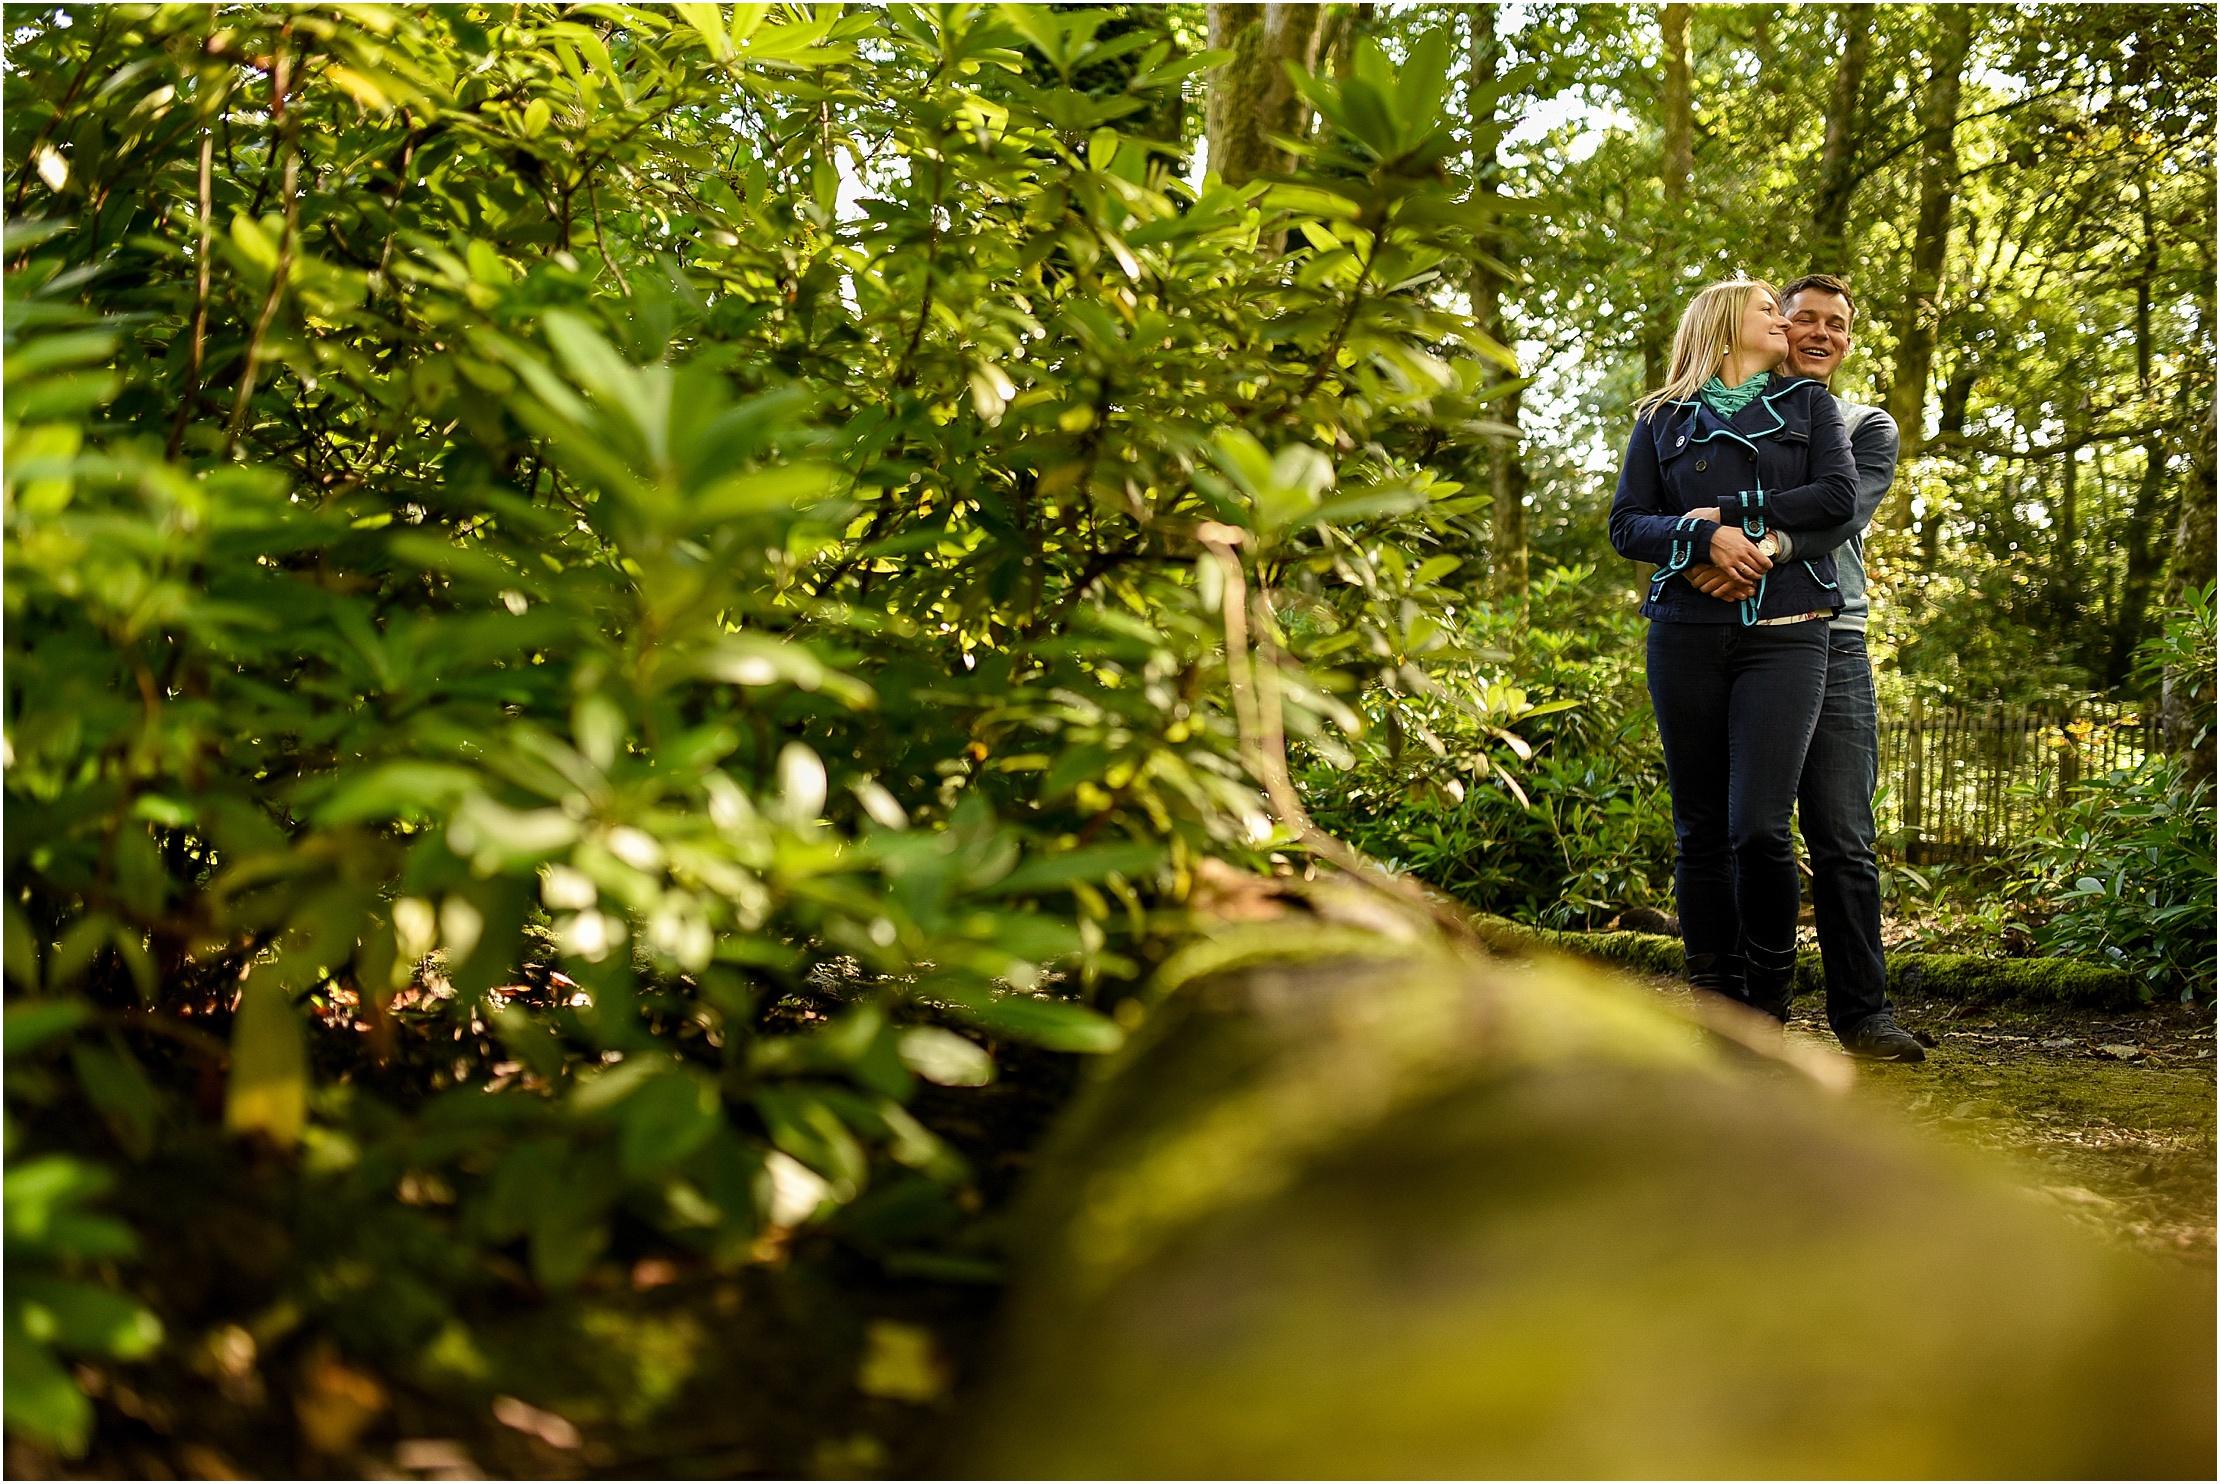 townley-park-pre-wedding-photography-11.jpg